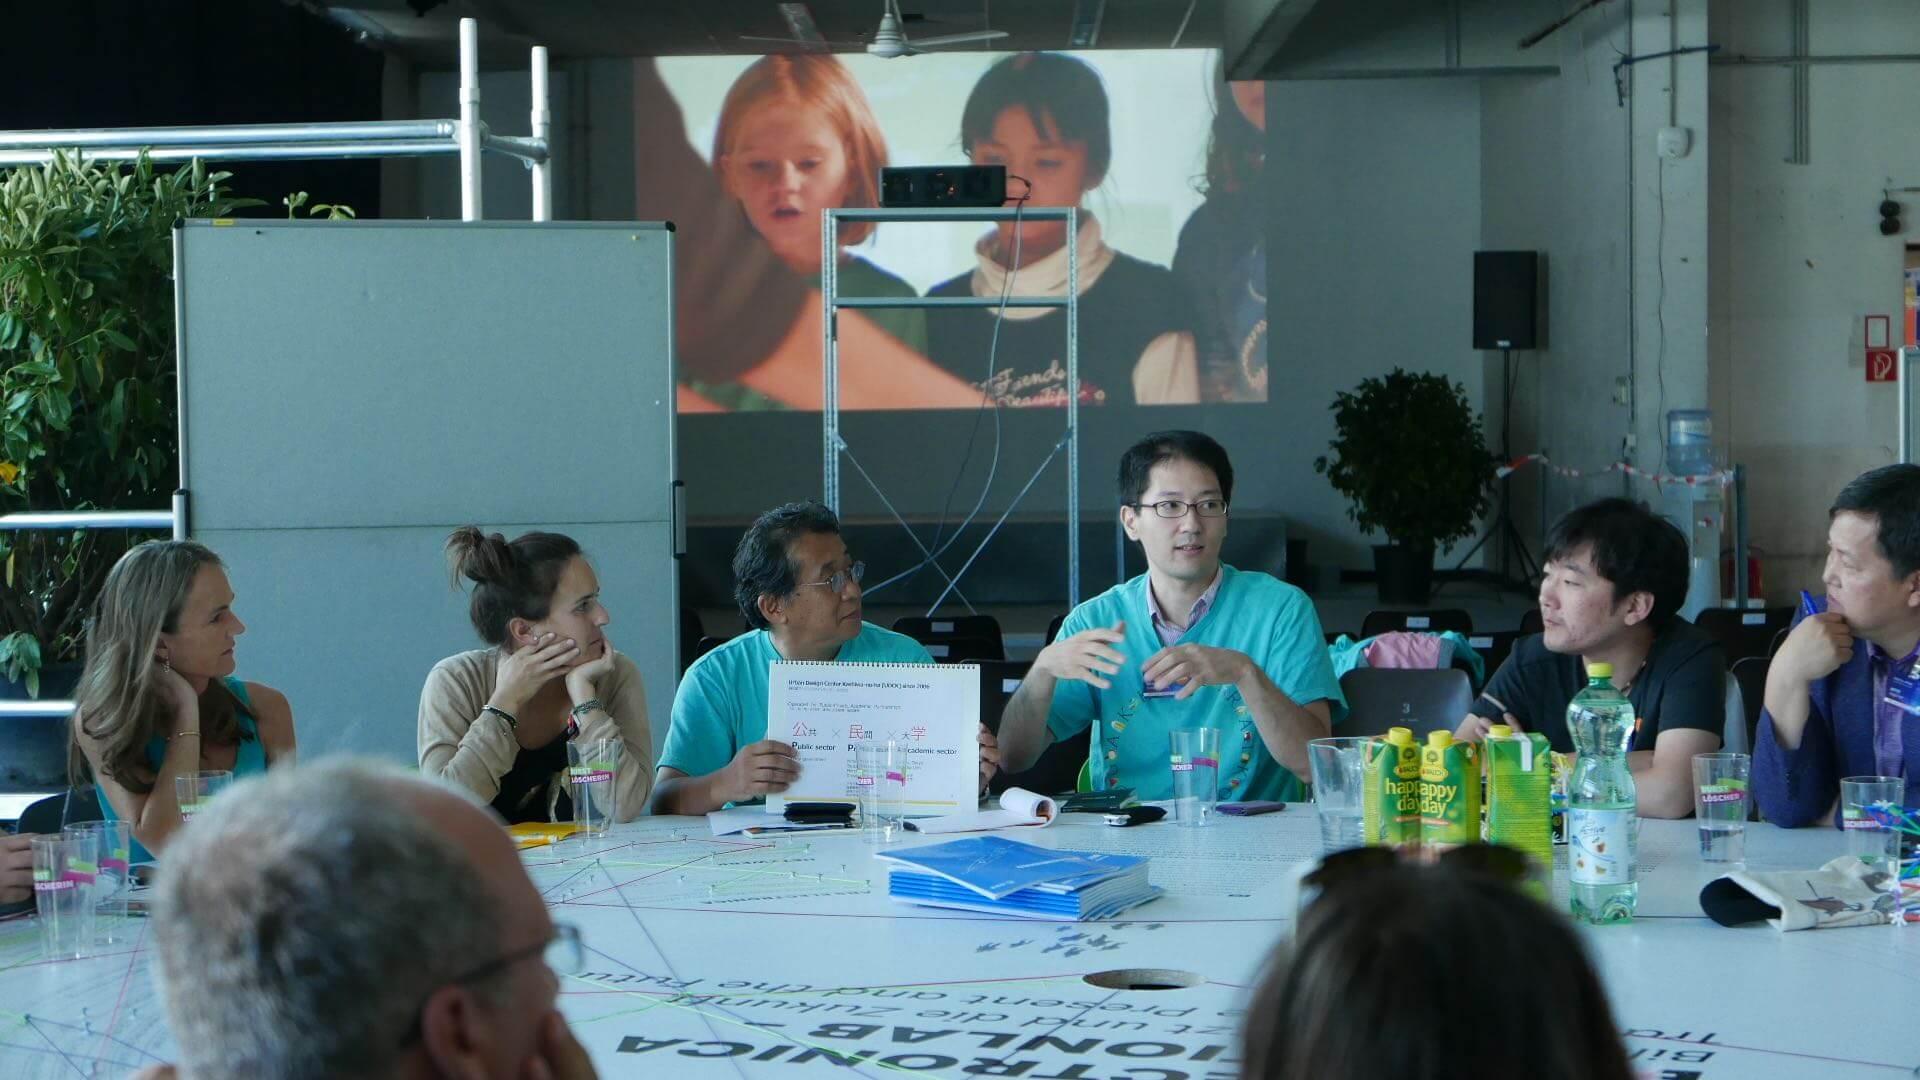 image of yohei yasutake at ARS Electronica